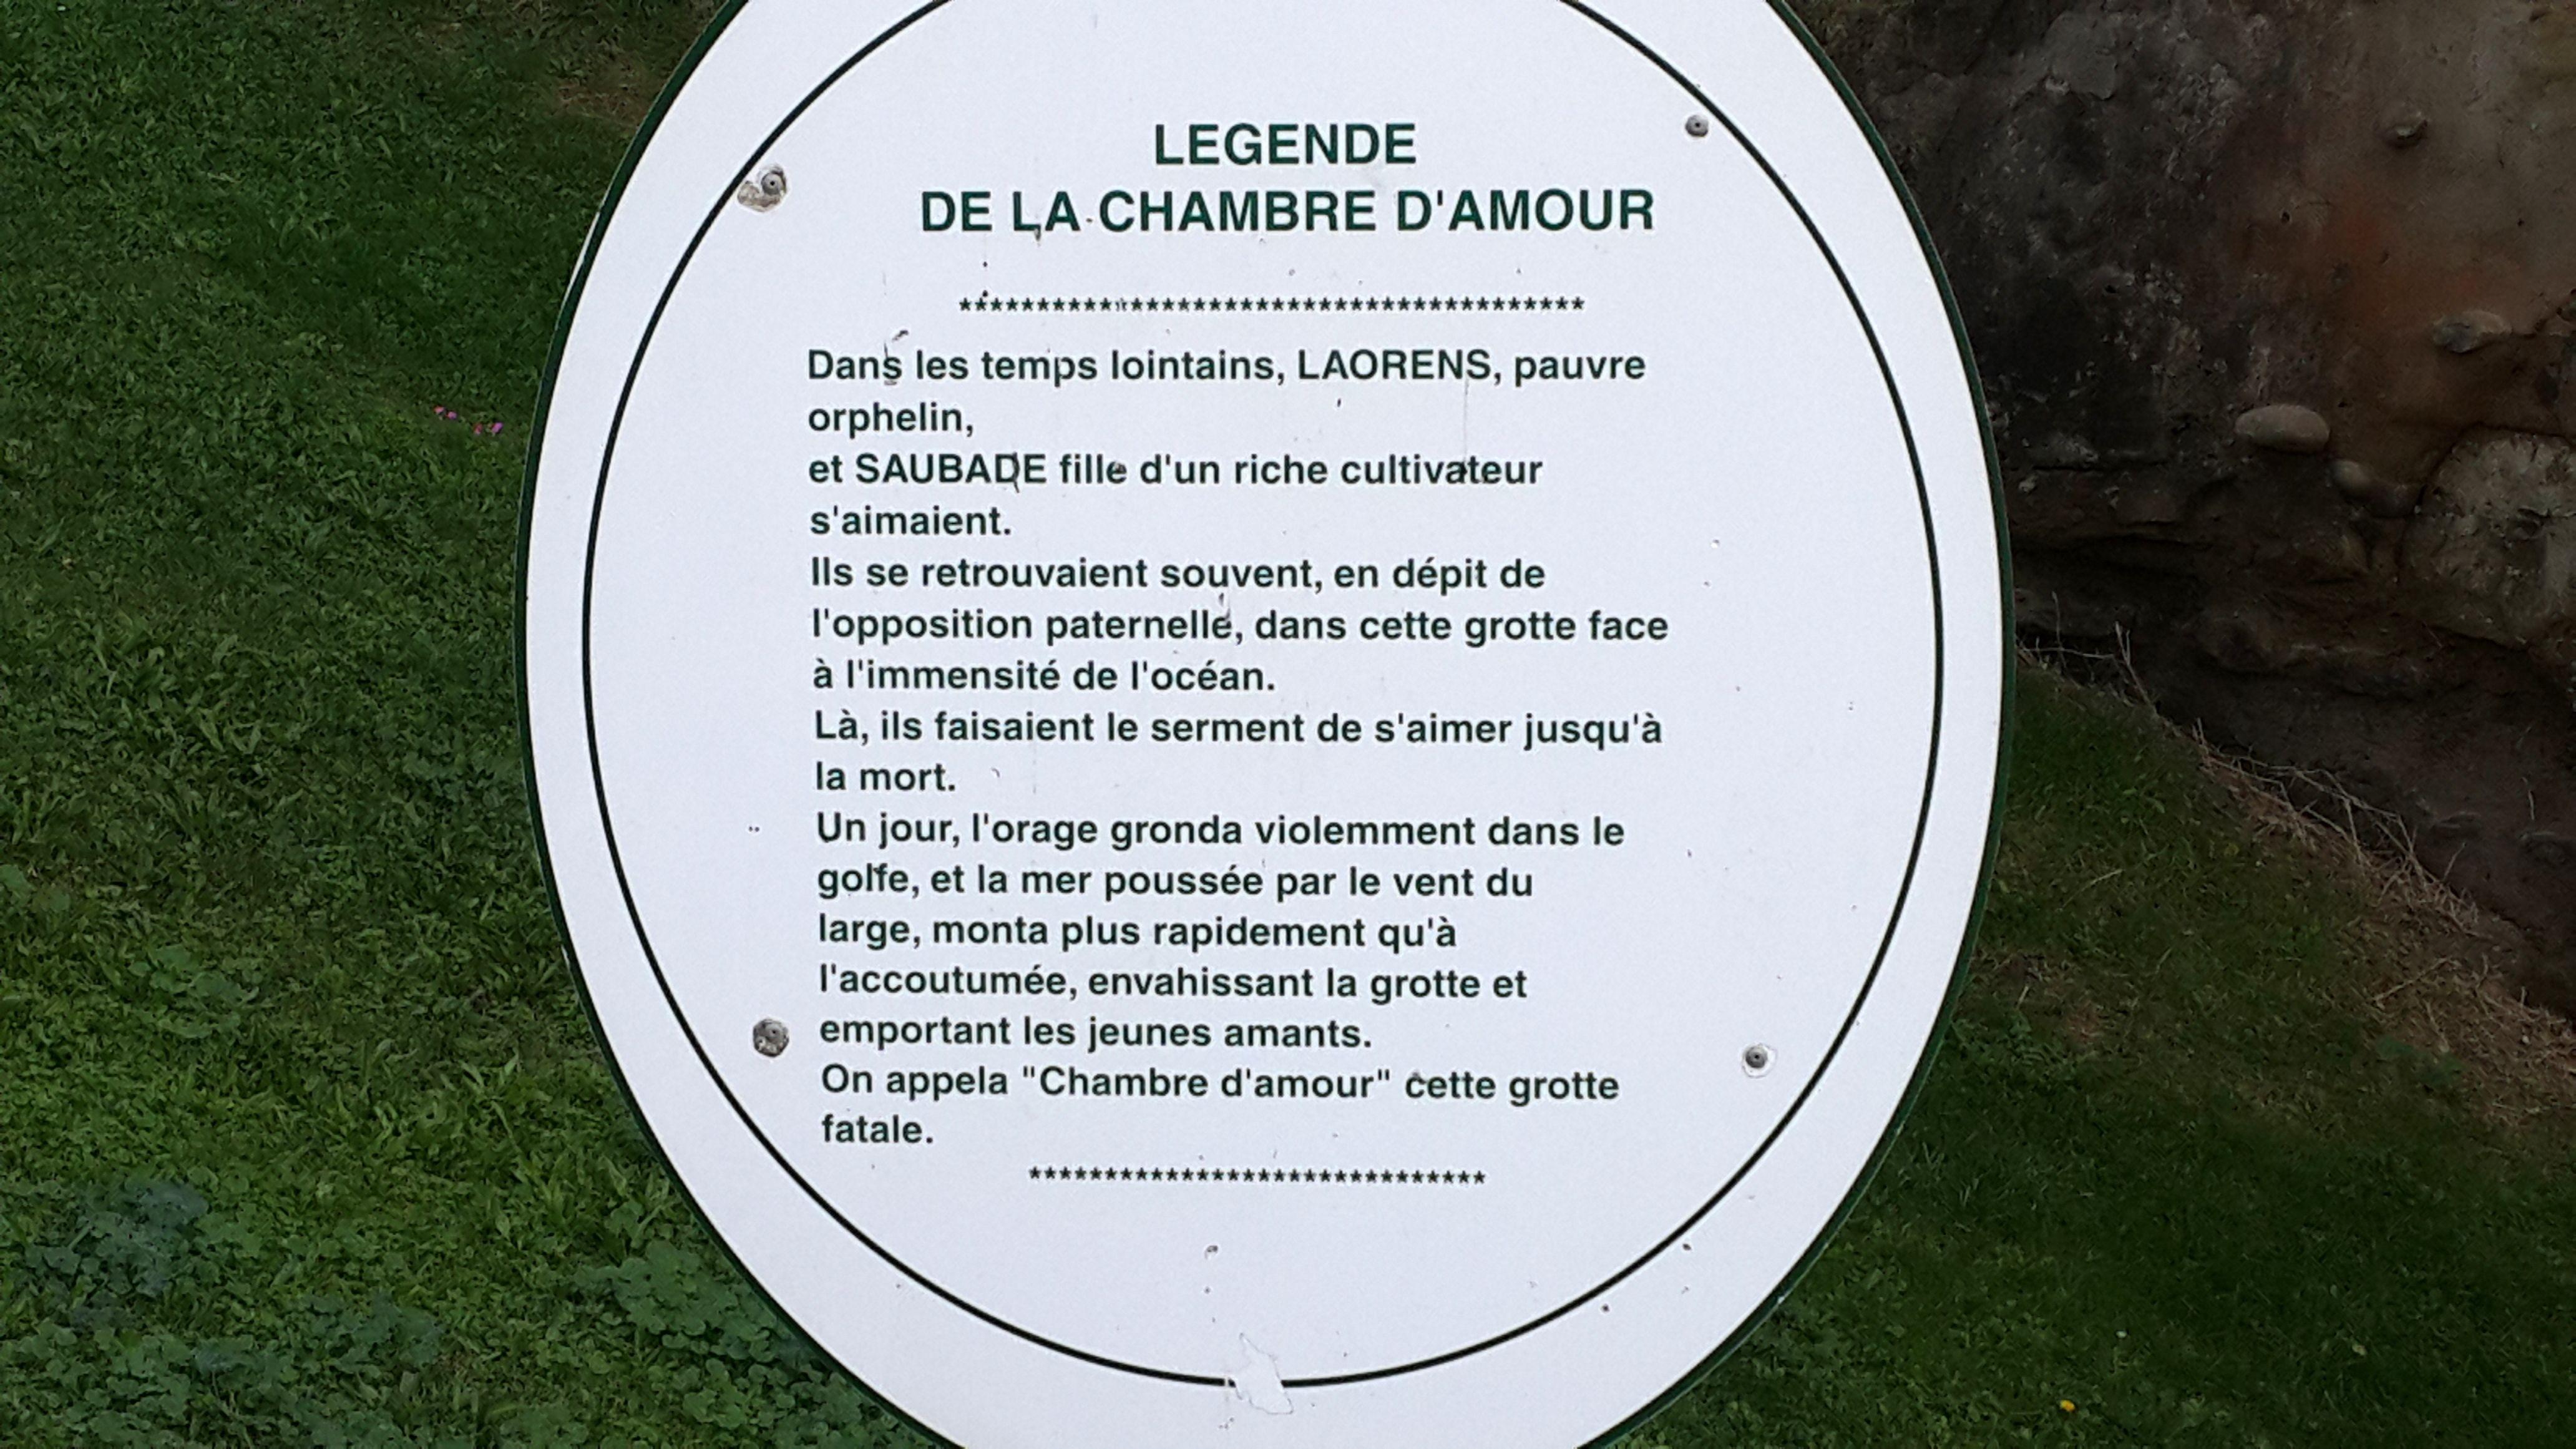 #232C16 26 Octobre 2013 Agadir Blog Par Michel Terrier 2893 plage de la petite chambre d'amour anglet 4128x2322 px @ aertt.com